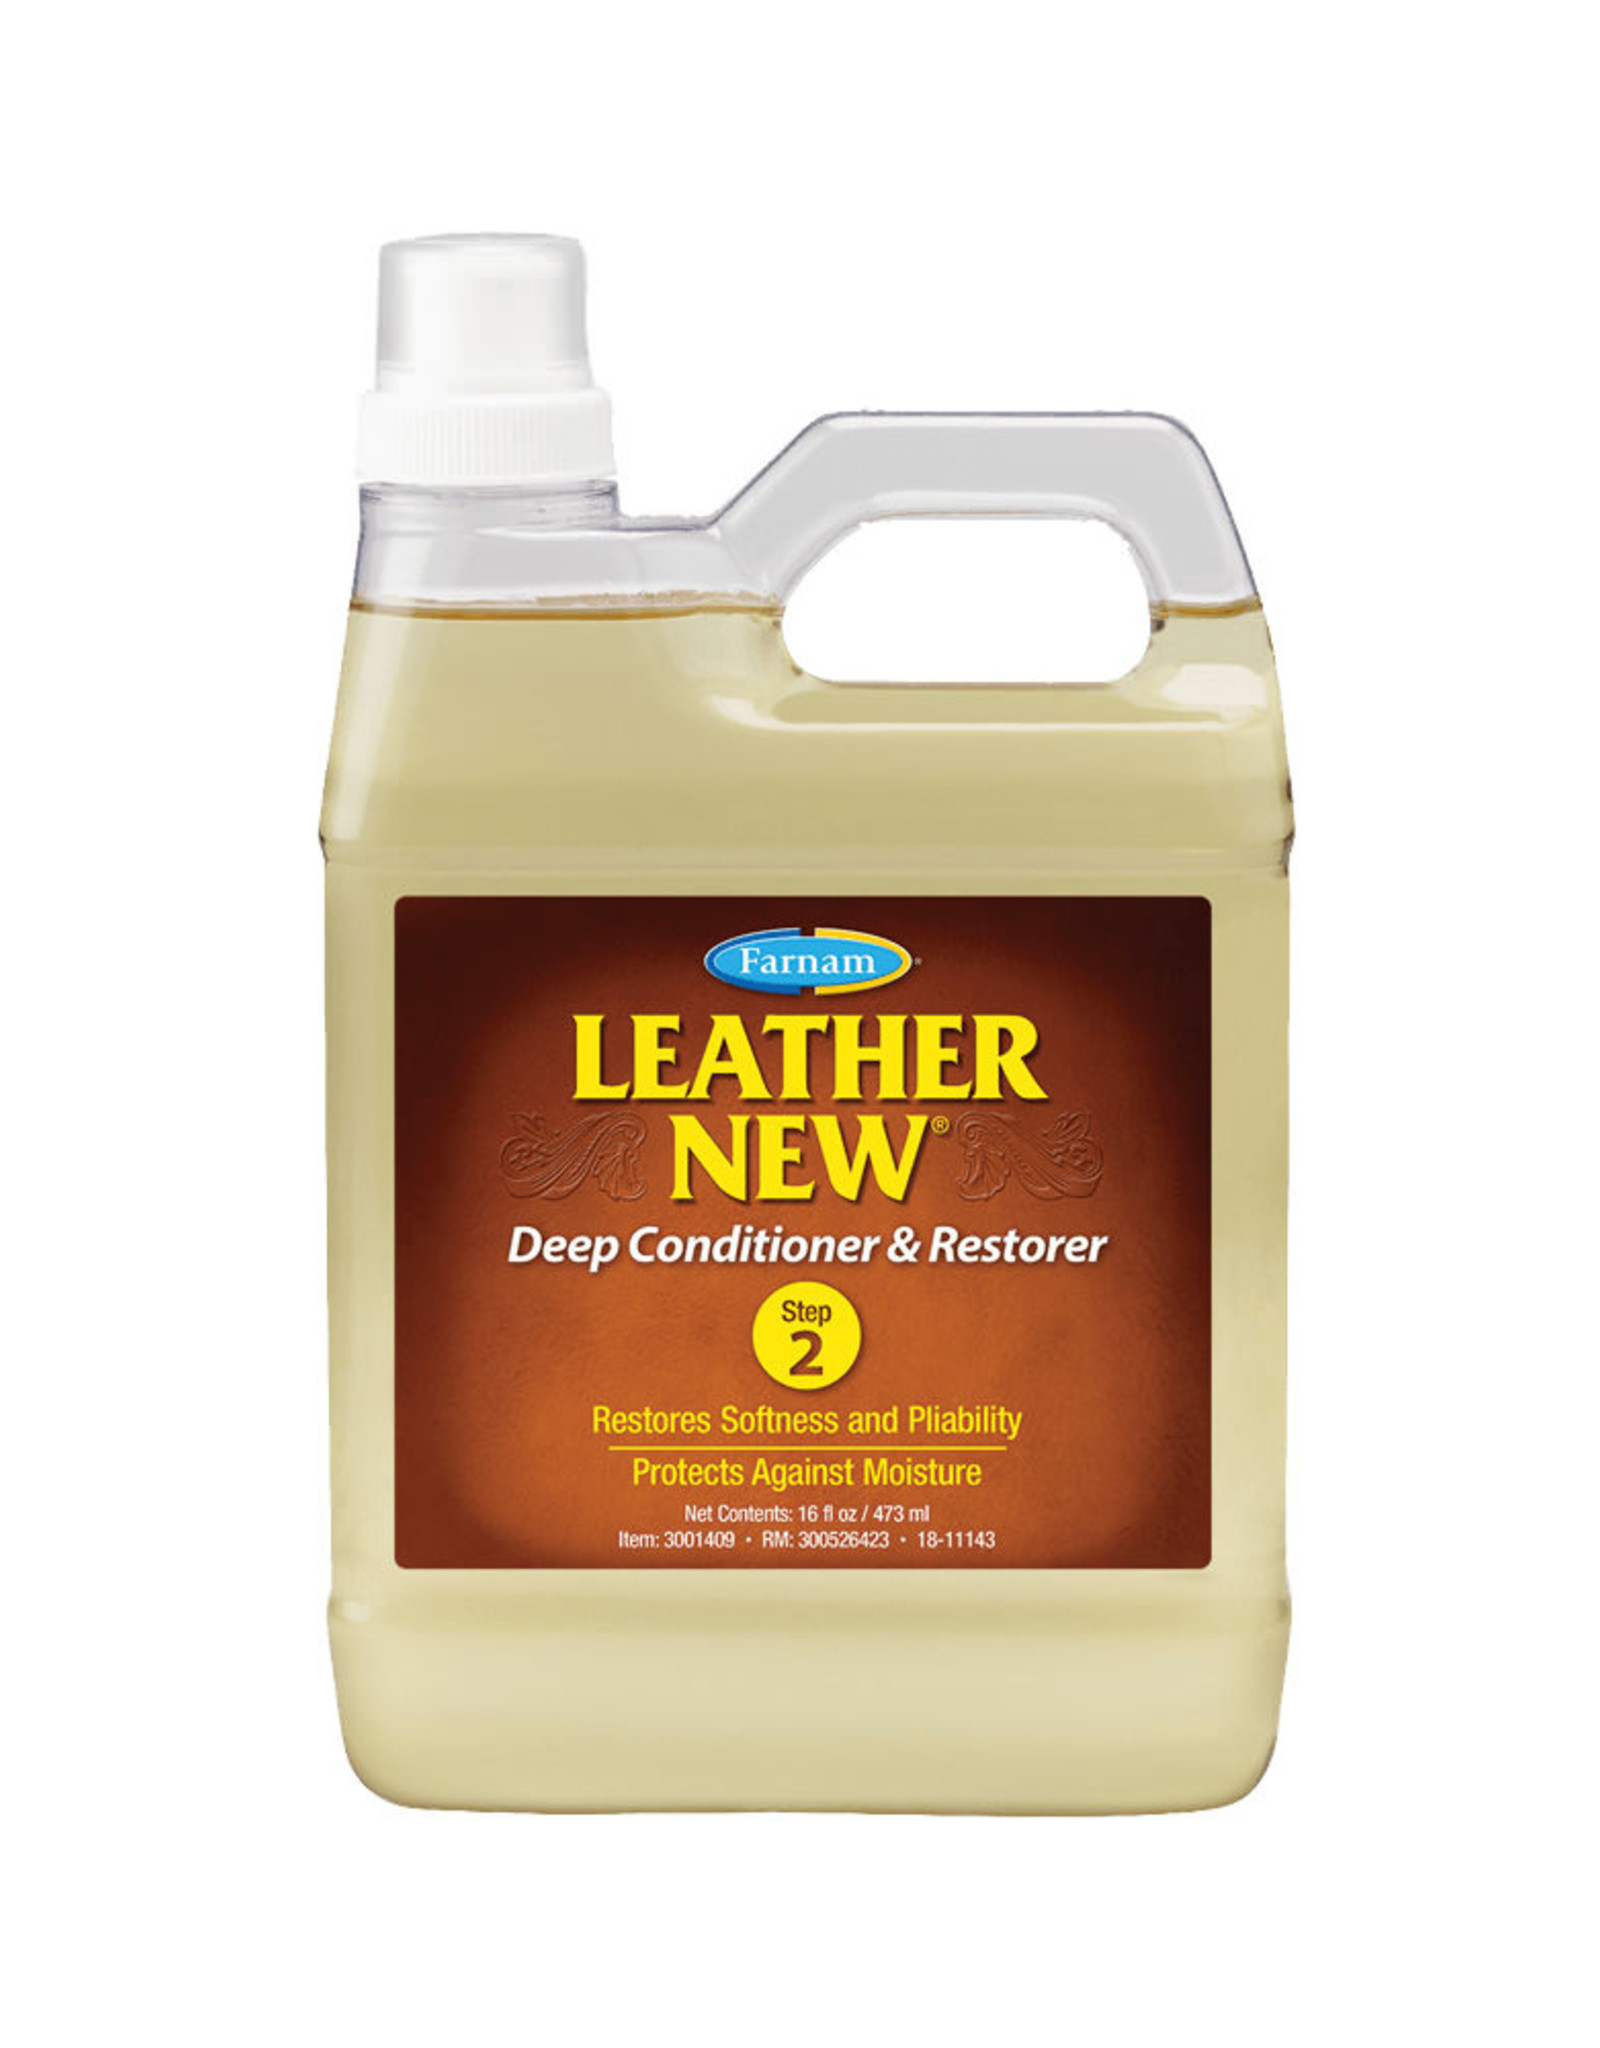 Farnam Leather New Stap 2